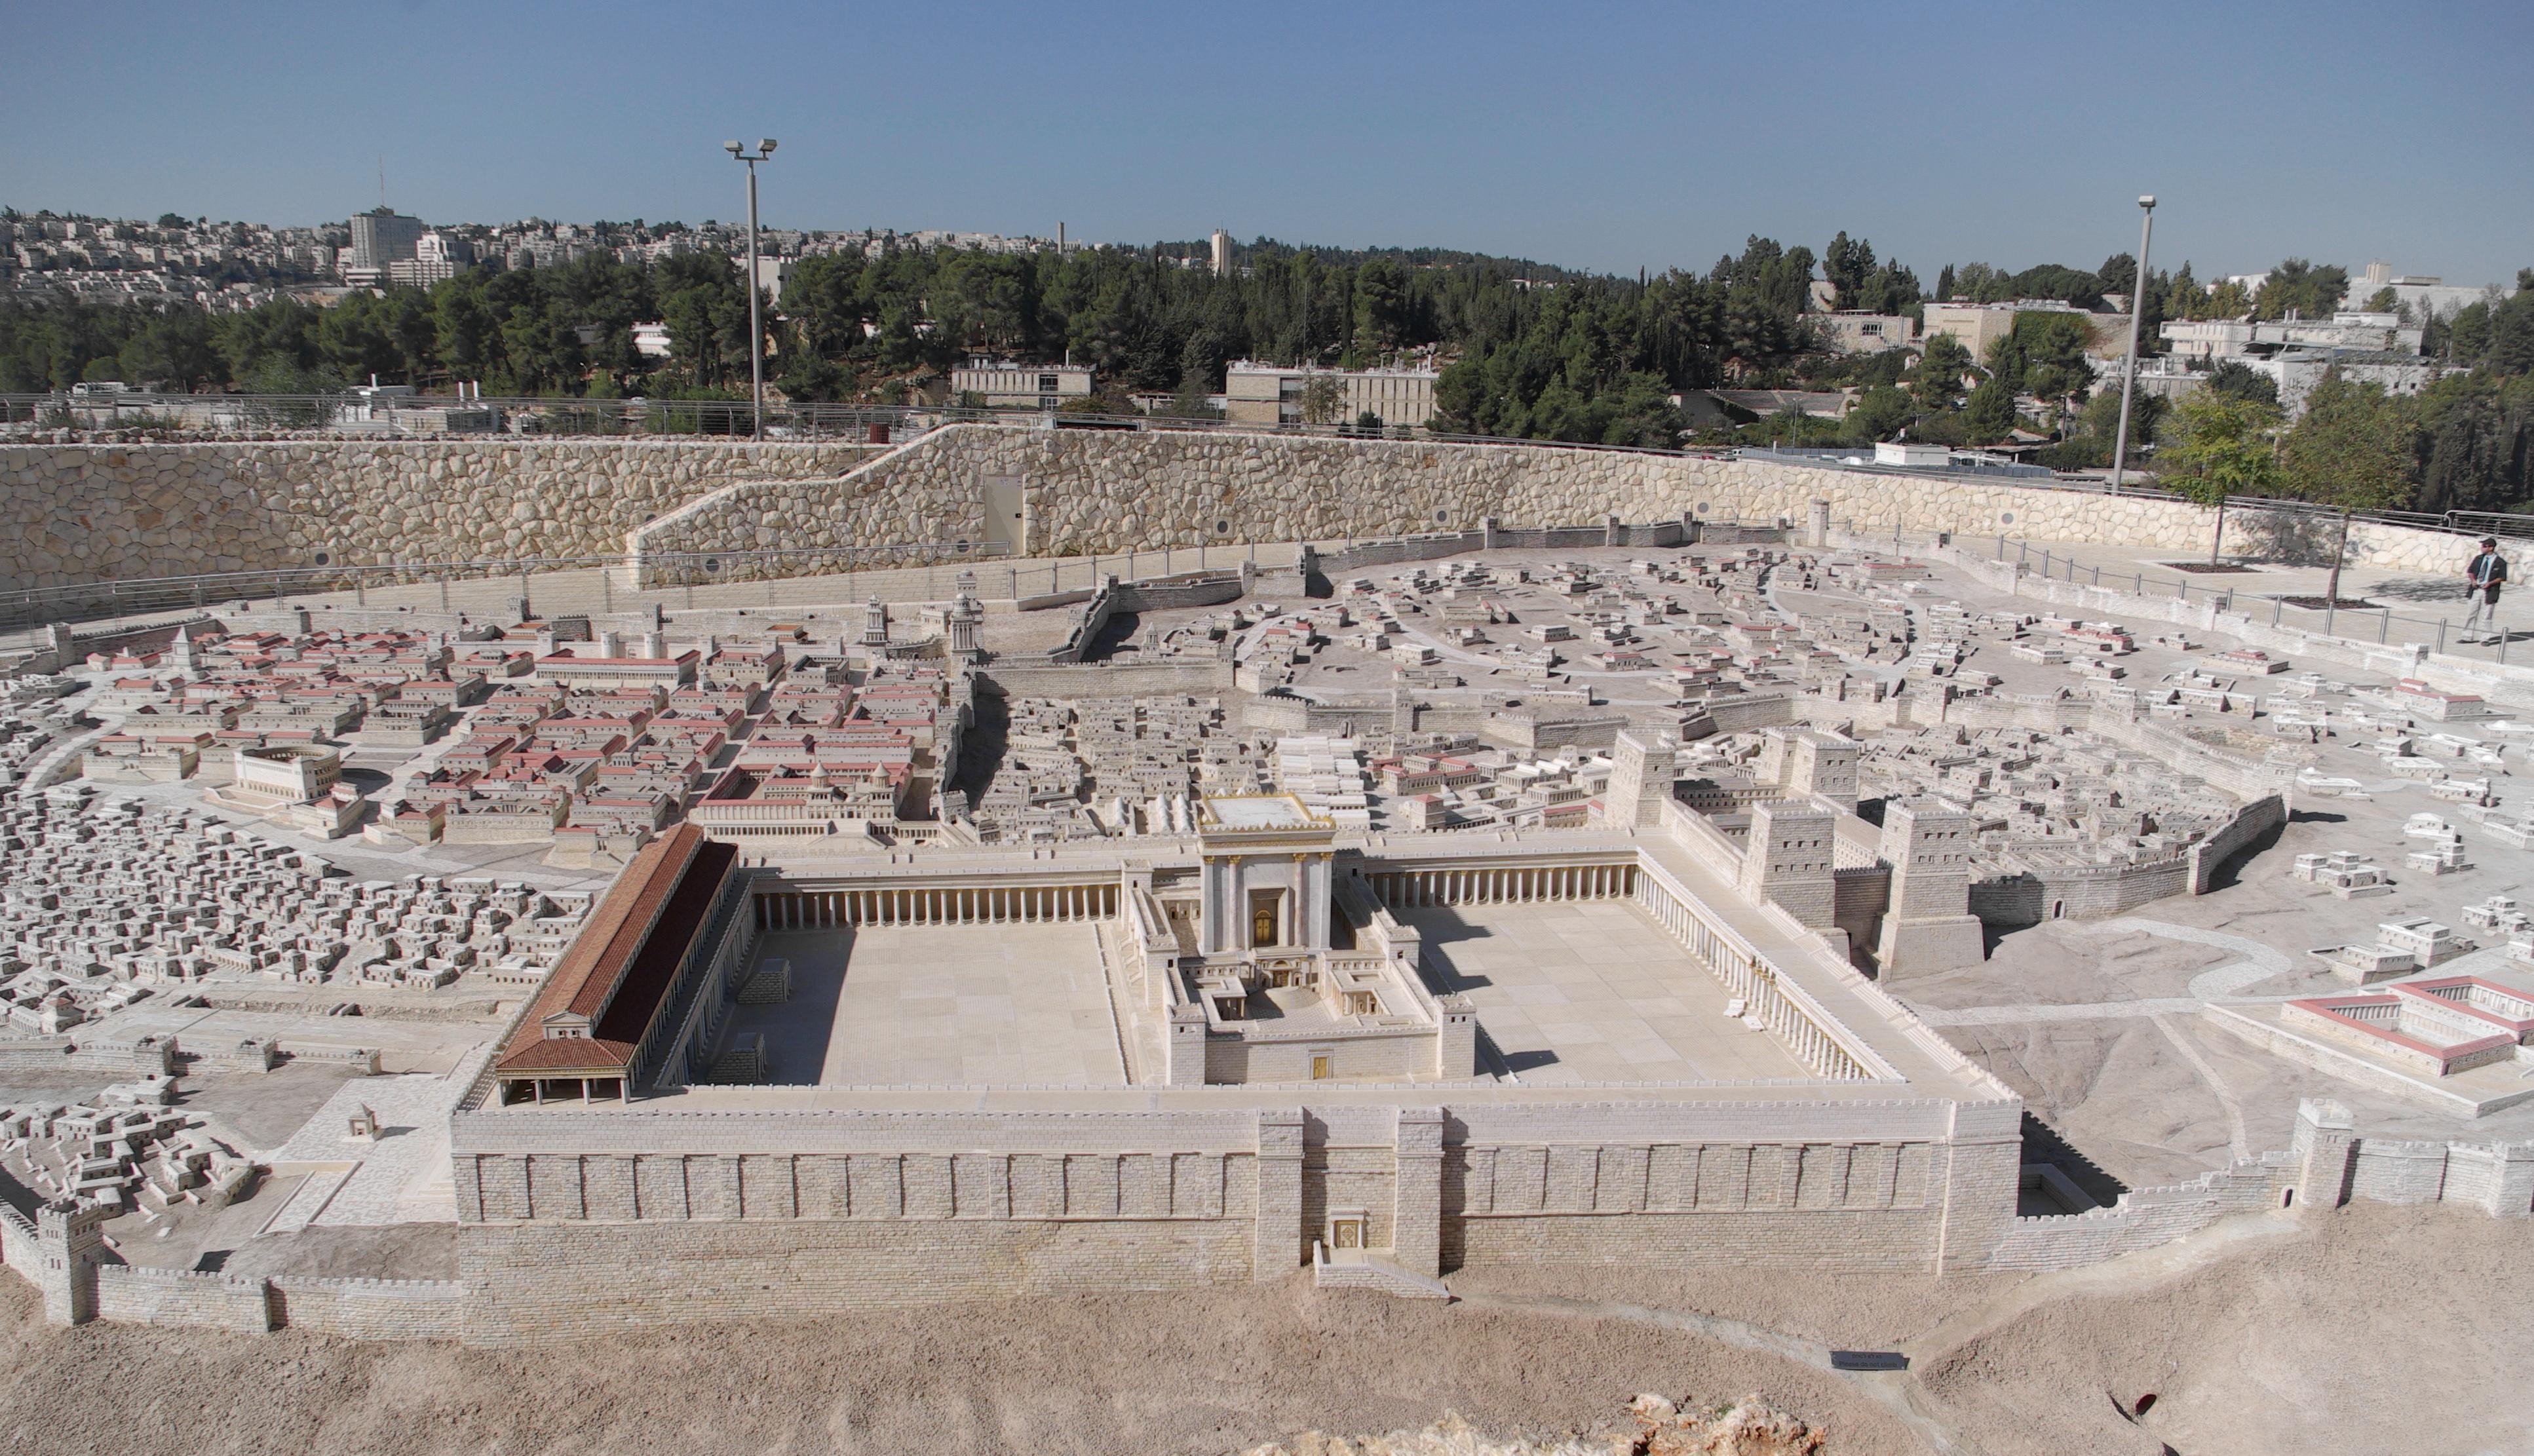 https://upload.wikimedia.org/wikipedia/commons/8/84/Jerusalem_Modell_BW_2.JPG